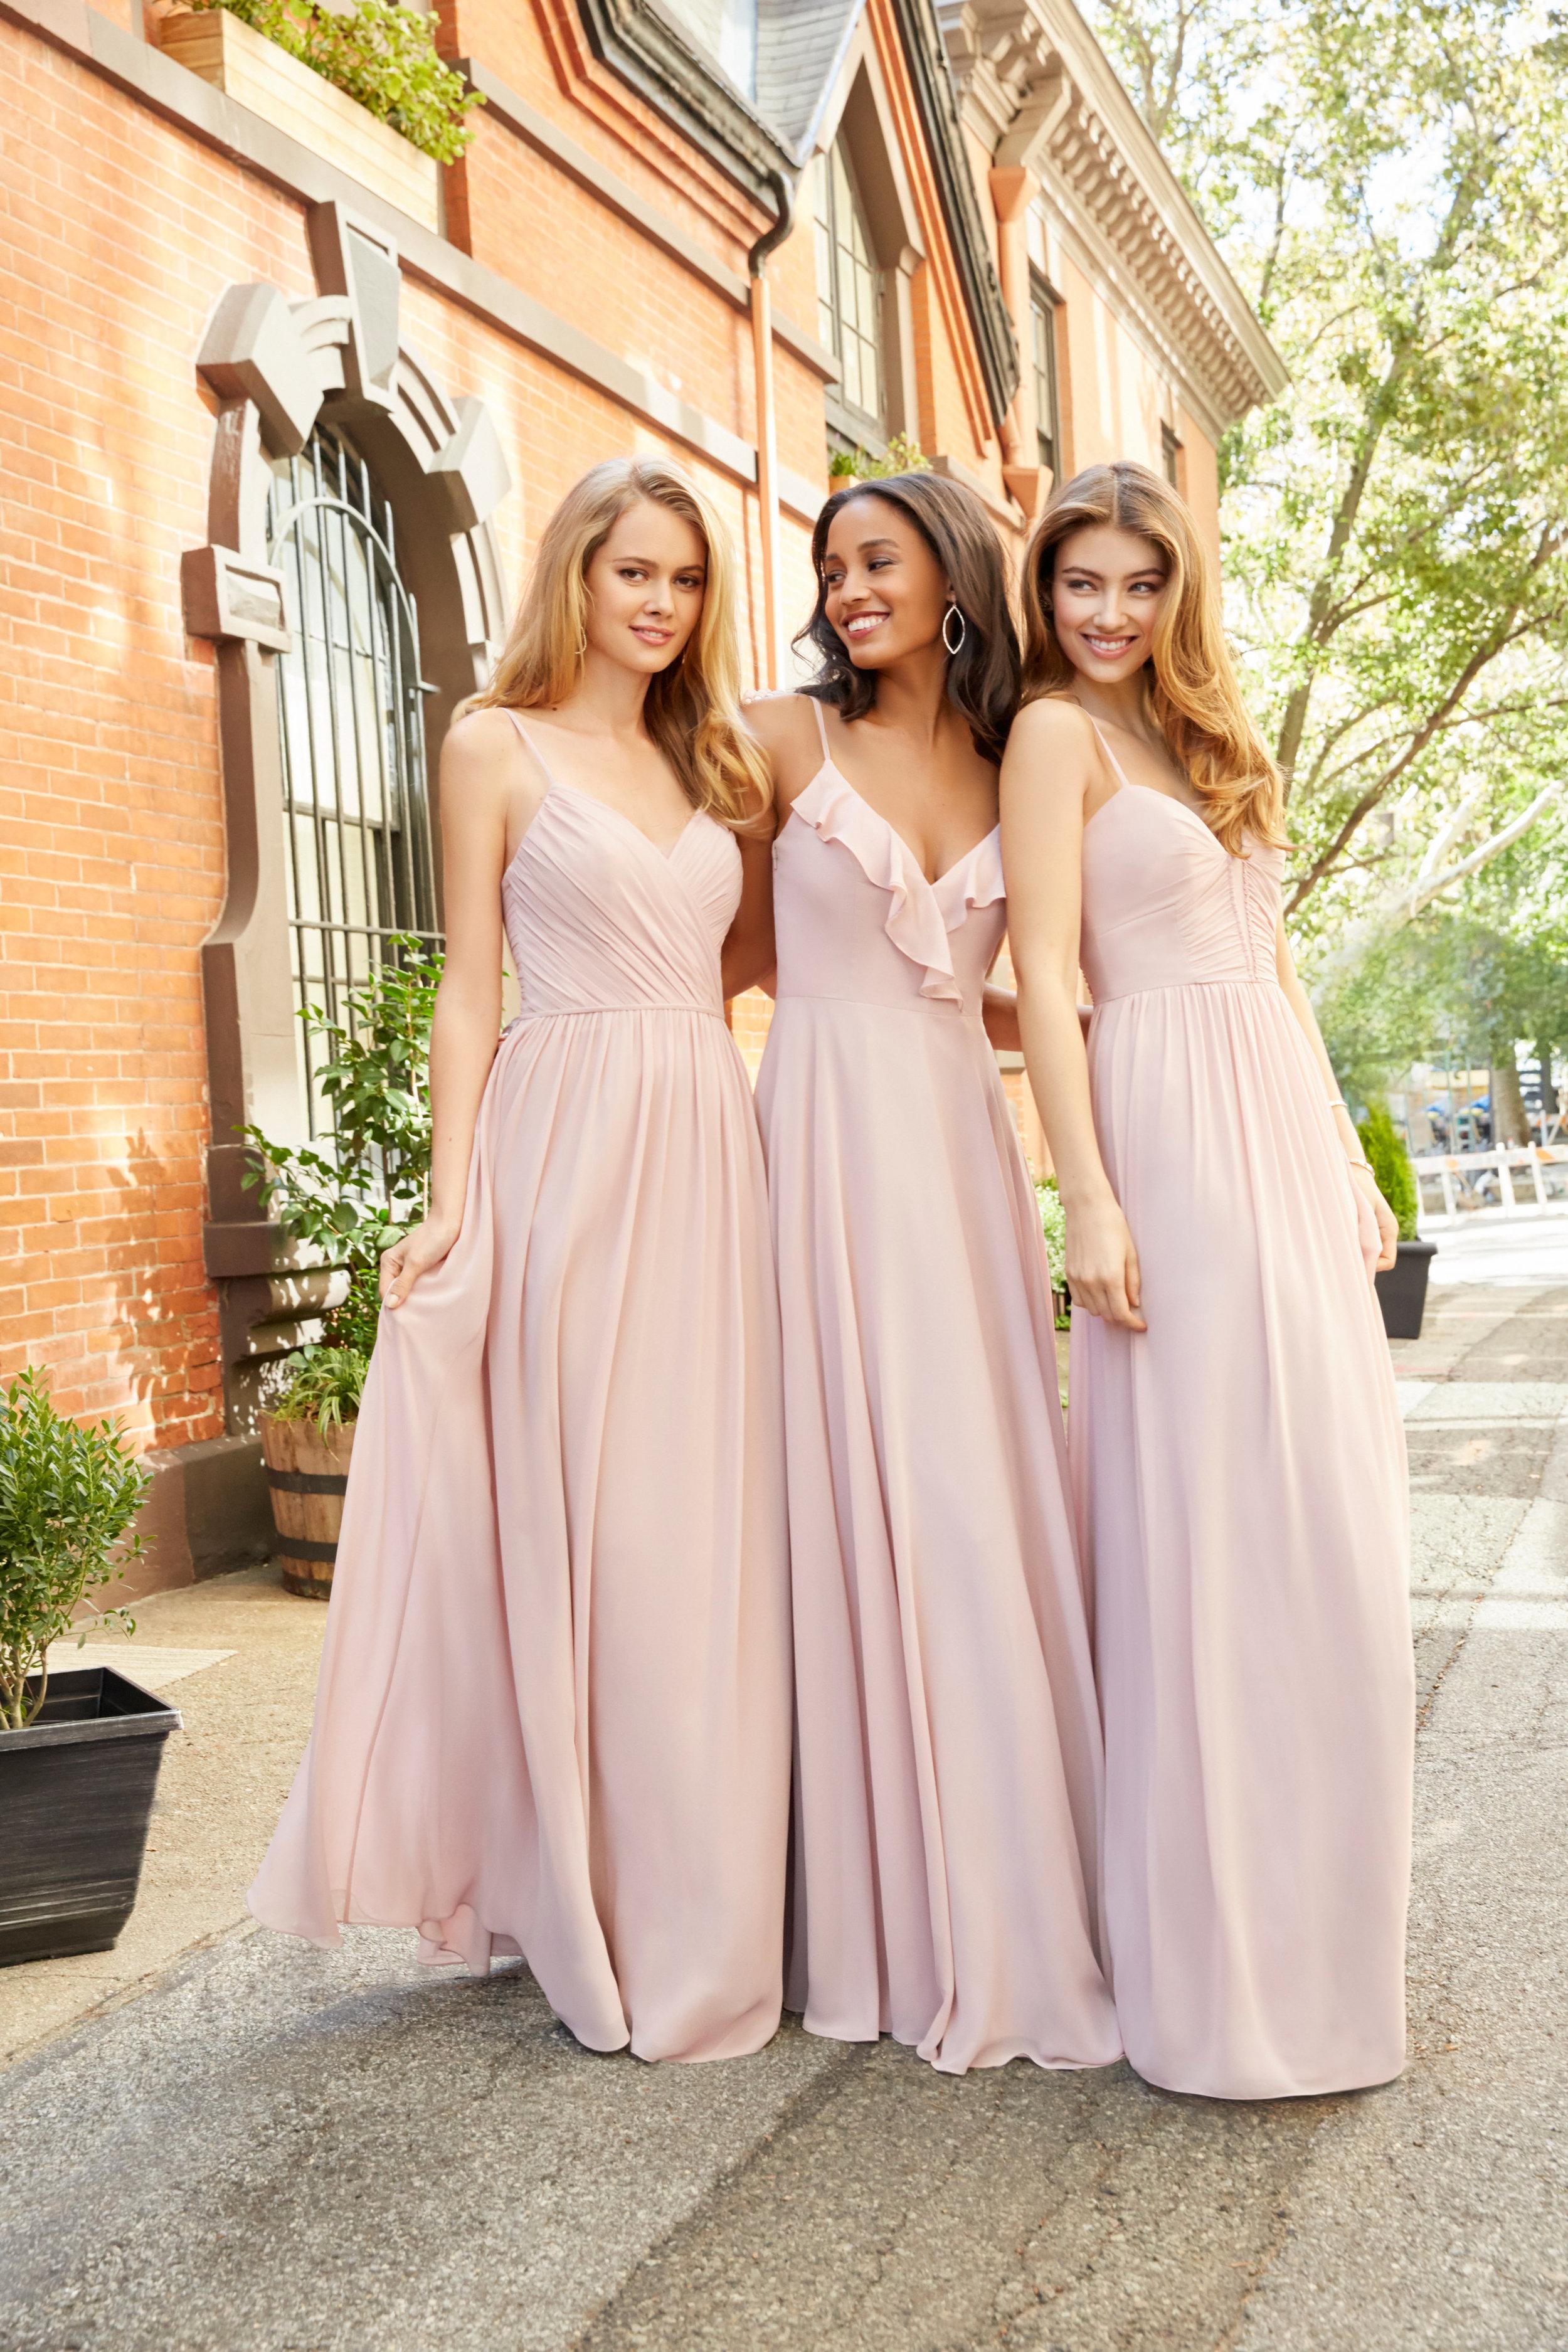 ivory-and-beau-savannah-bridal-shop-savannah-bridesmaids-dresses-blush-bridesmaids-dresses-bridesmaids-sale-savannah-wedding-dresses-savannah-wedding-shop-hayley-paige-occasions-bridesmaids-and-special-occasion-spring-2018-style-5804_7.jpg